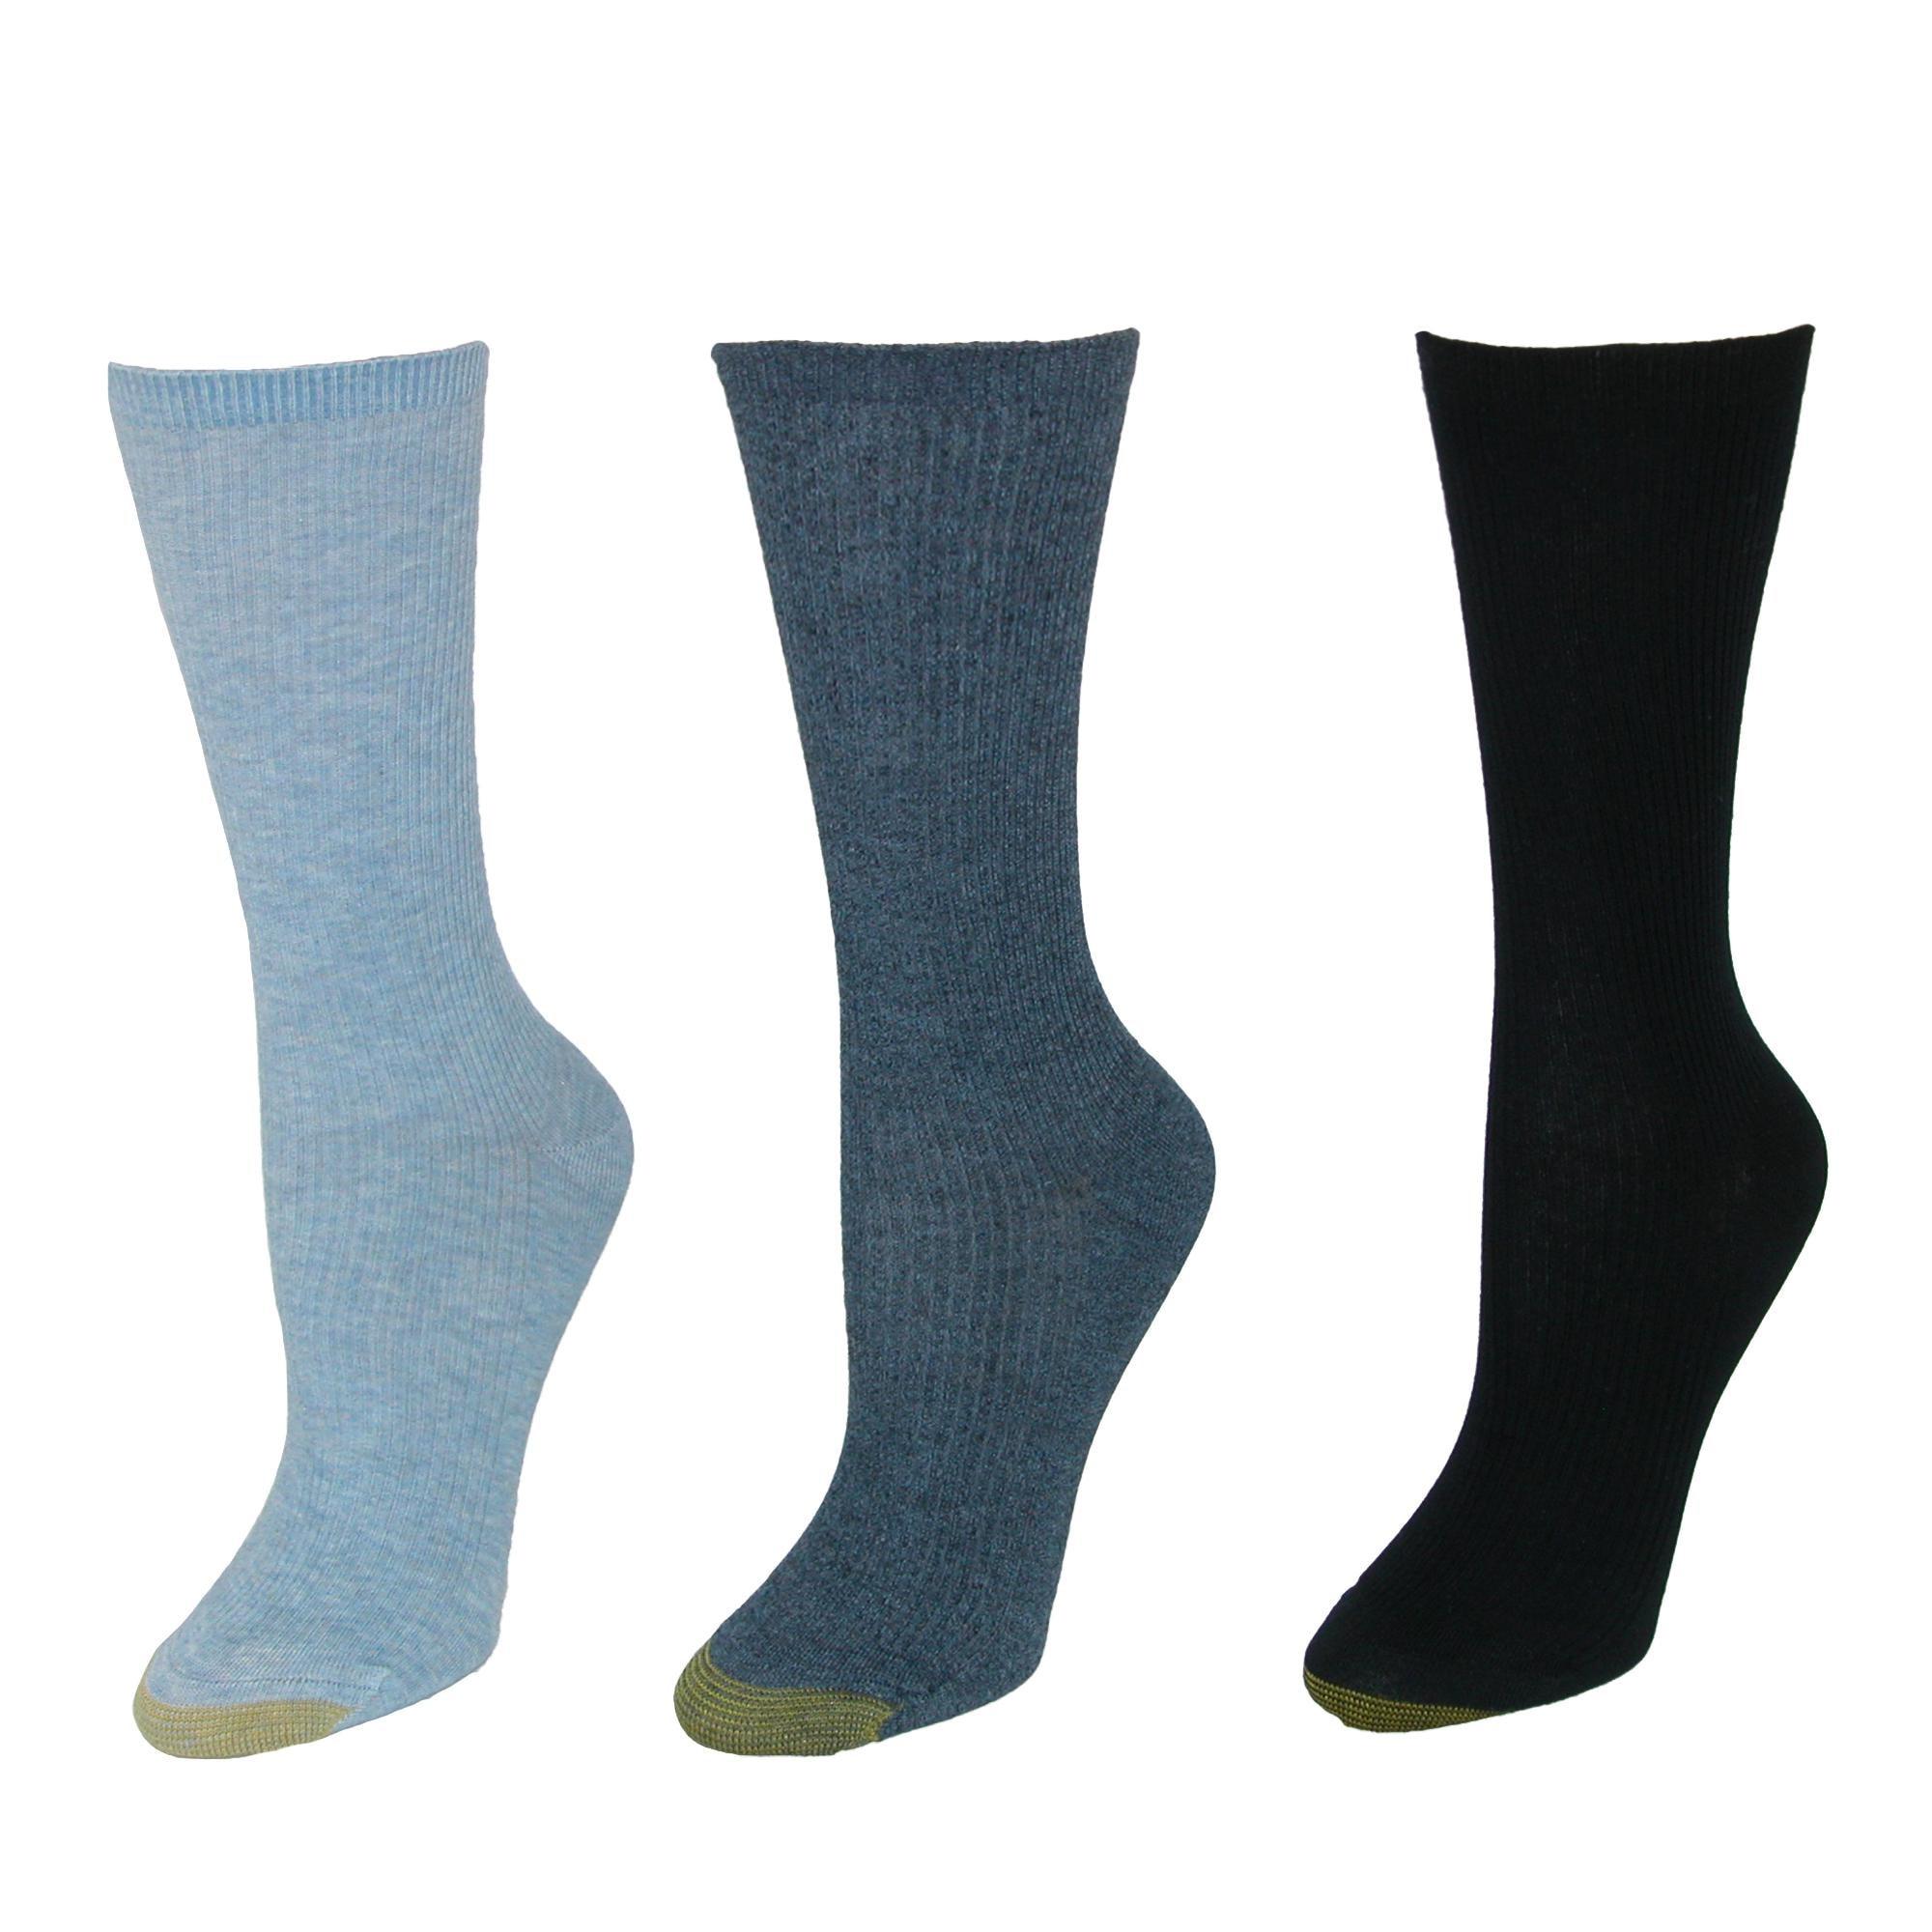 3 Pair Pack New Gold Toe Women/'s Non Binding Ribbed Crew Socks